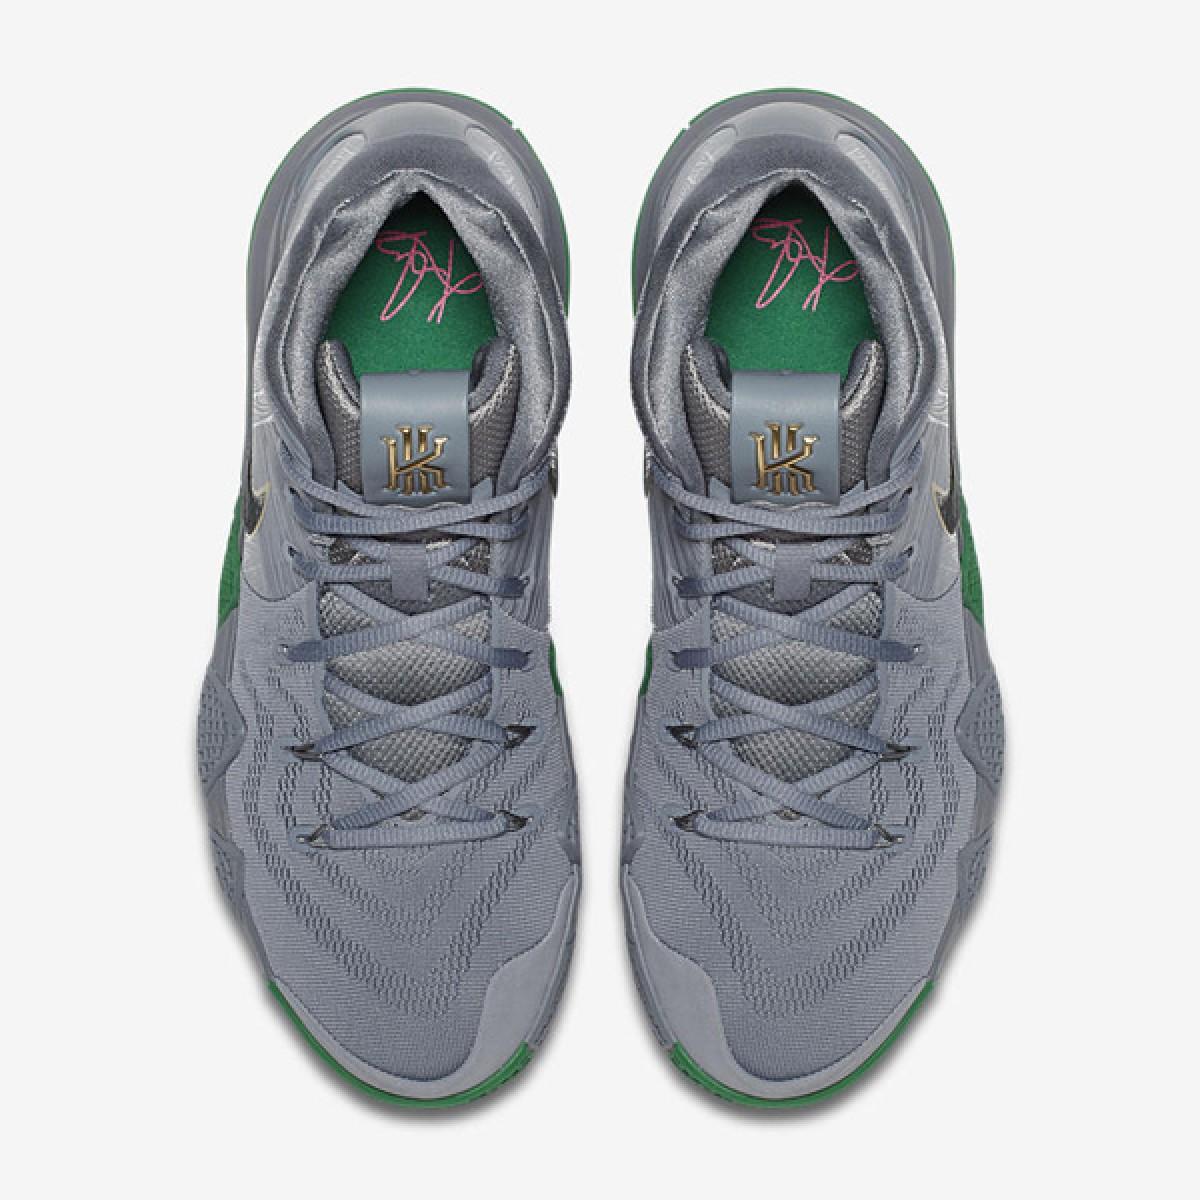 5e25d0eca483 Buy Nike Kyrie 4  City Guardians  Basketball shoes   sneakers